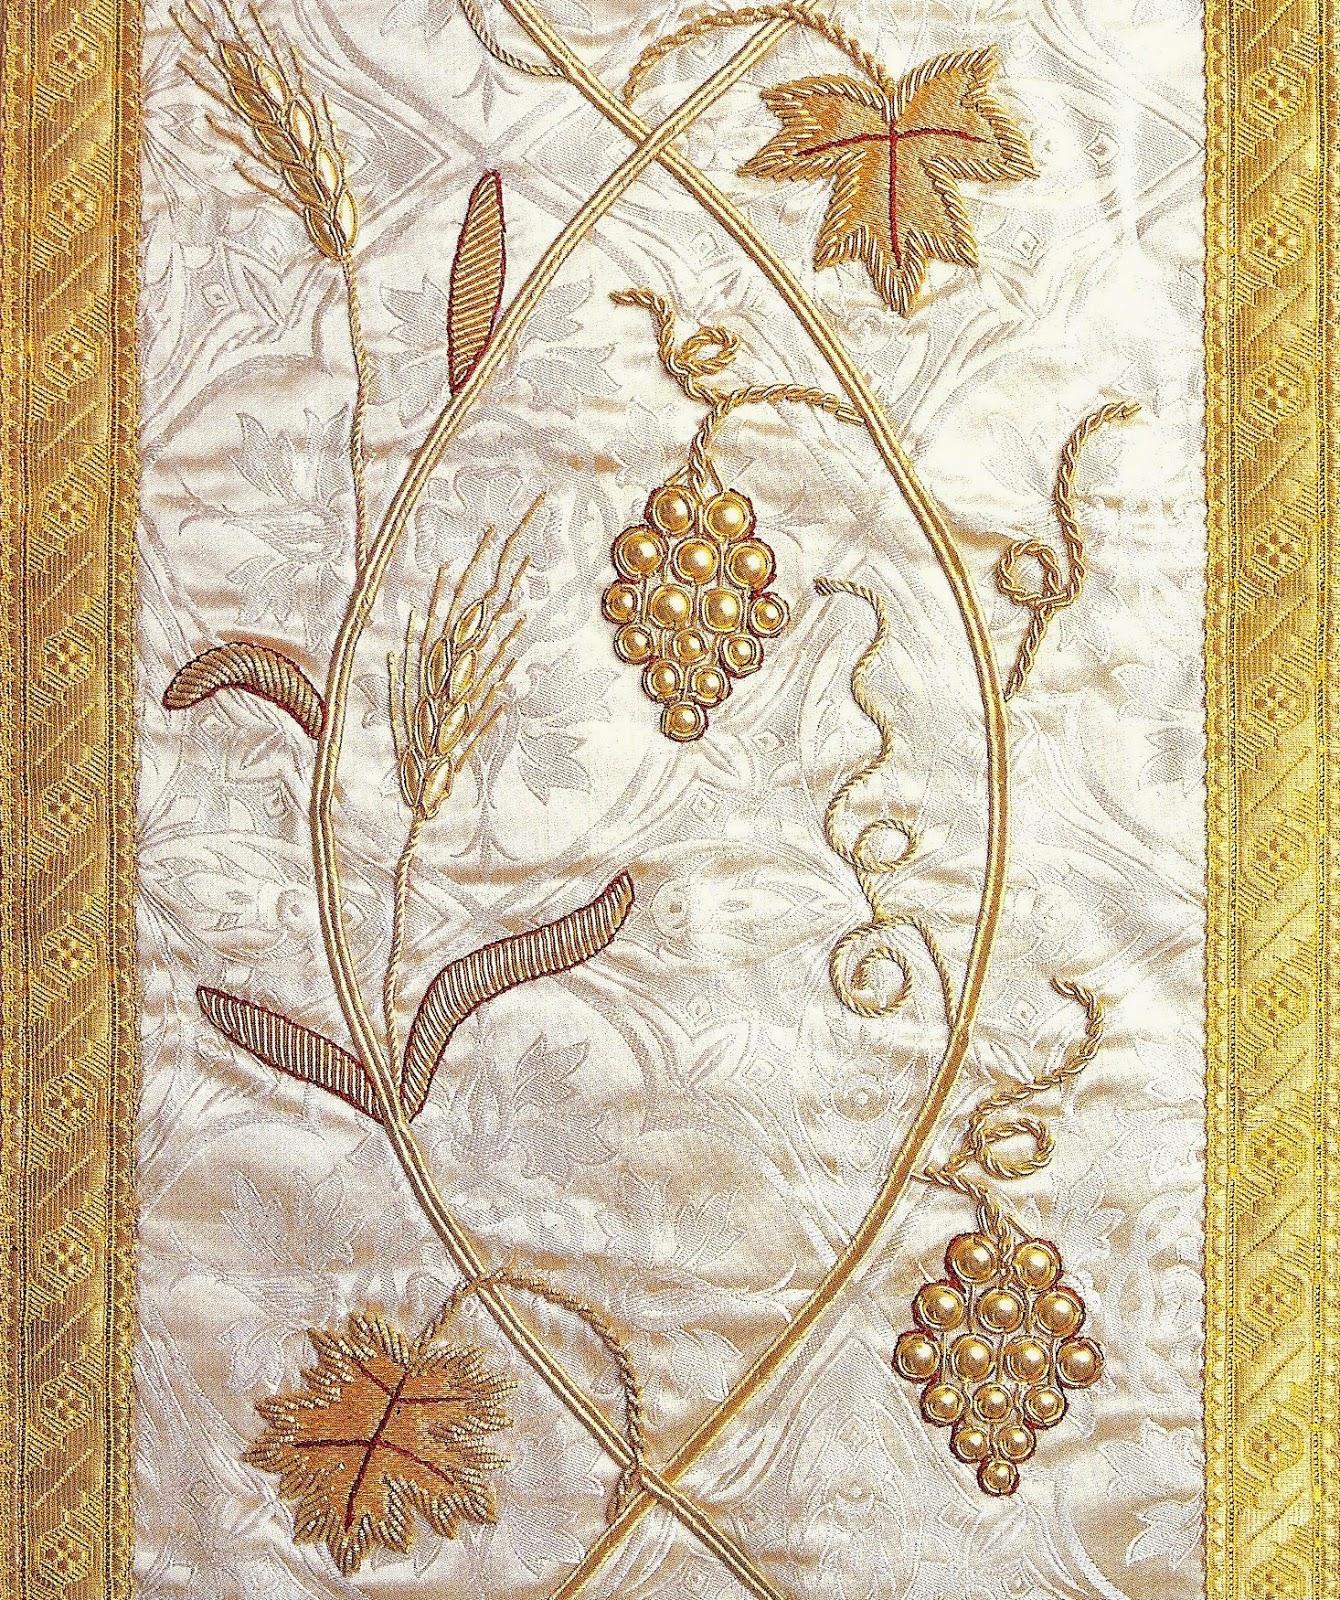 Art Quill Studio: 19th to 20th Century Australian Christian Embroidery[1]Art  EssayMarie-Therese Wisniowski